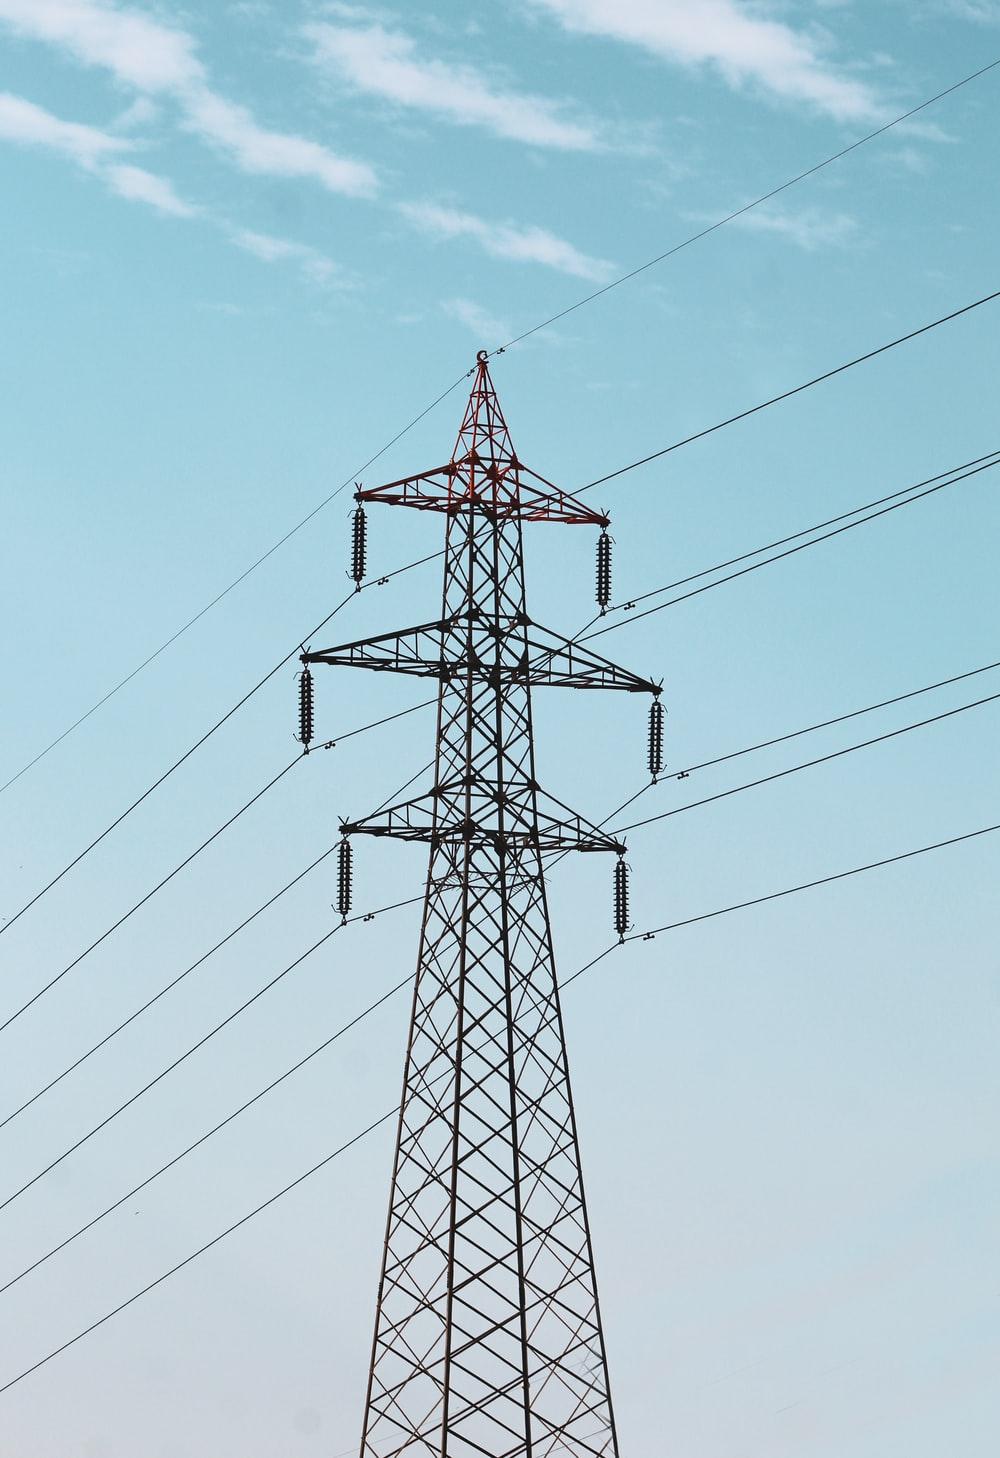 electric transmitter under blue sky